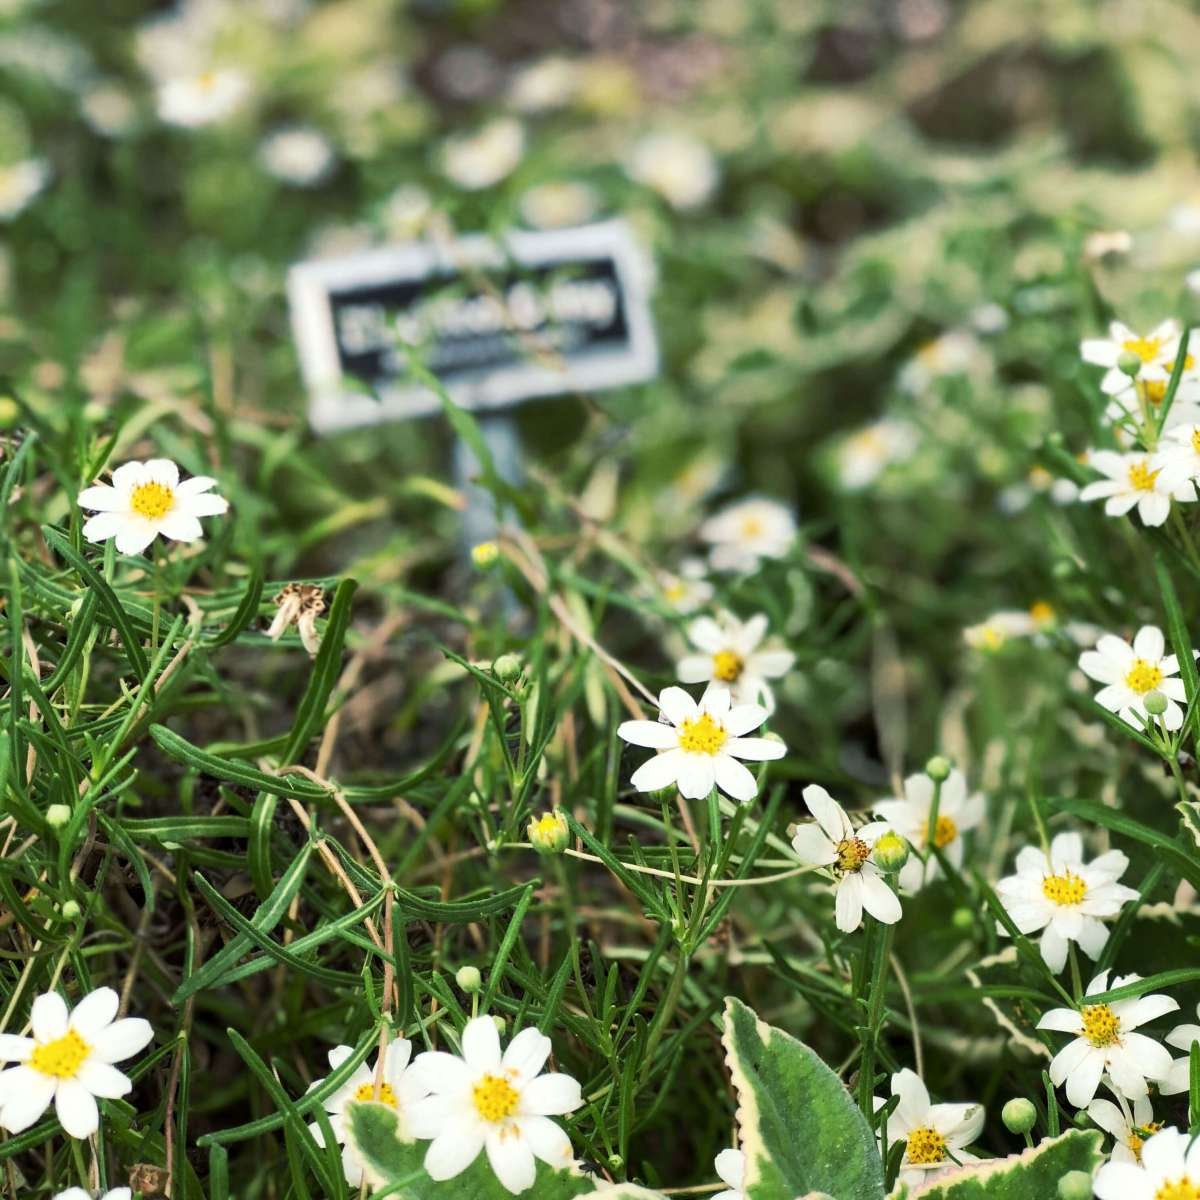 Flowers in the Zilker Botanical Garden in Austin, Texas